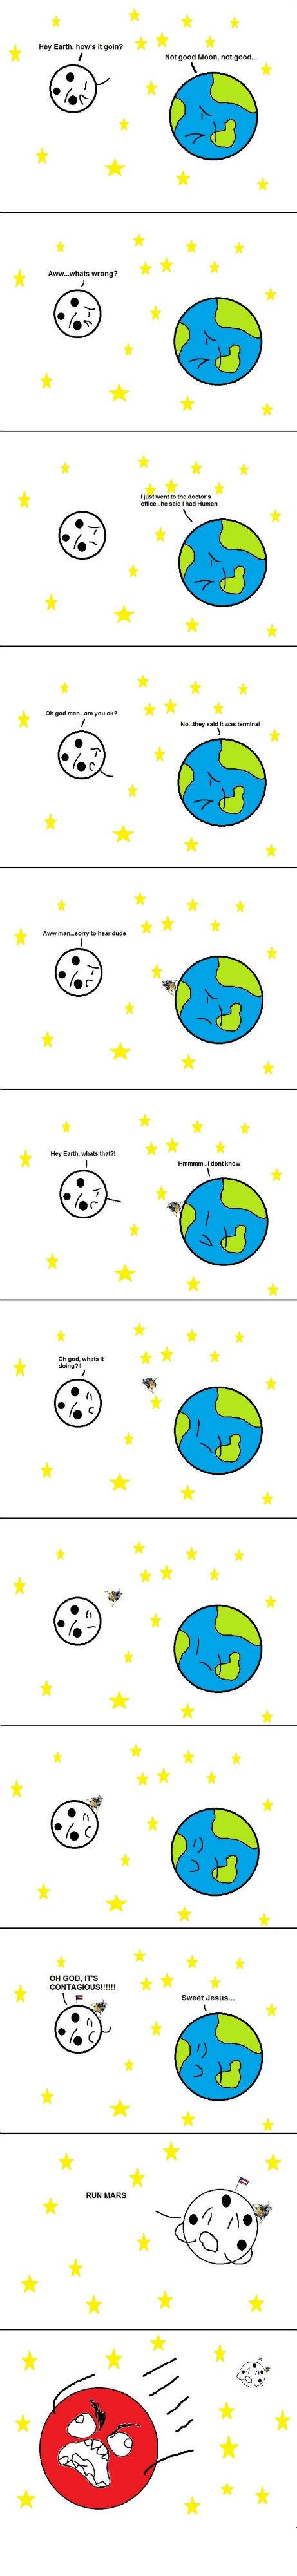 You got Human. not oc.. just funny. Immy Earth, It guan? I that wand Mann. not quad... Aww... Alma's wrung? Oh and min_. lri} rau uh? I mural Aw dude DH GHQ, IT